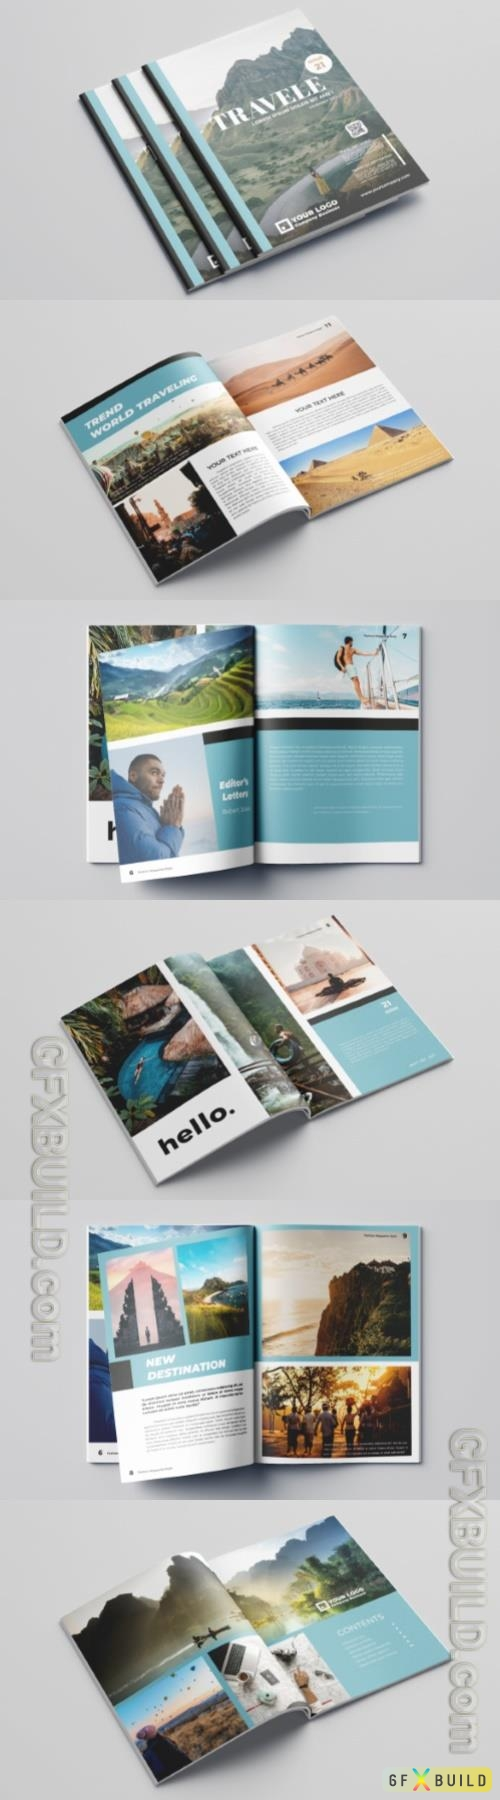 Travel Magazine Vol.1